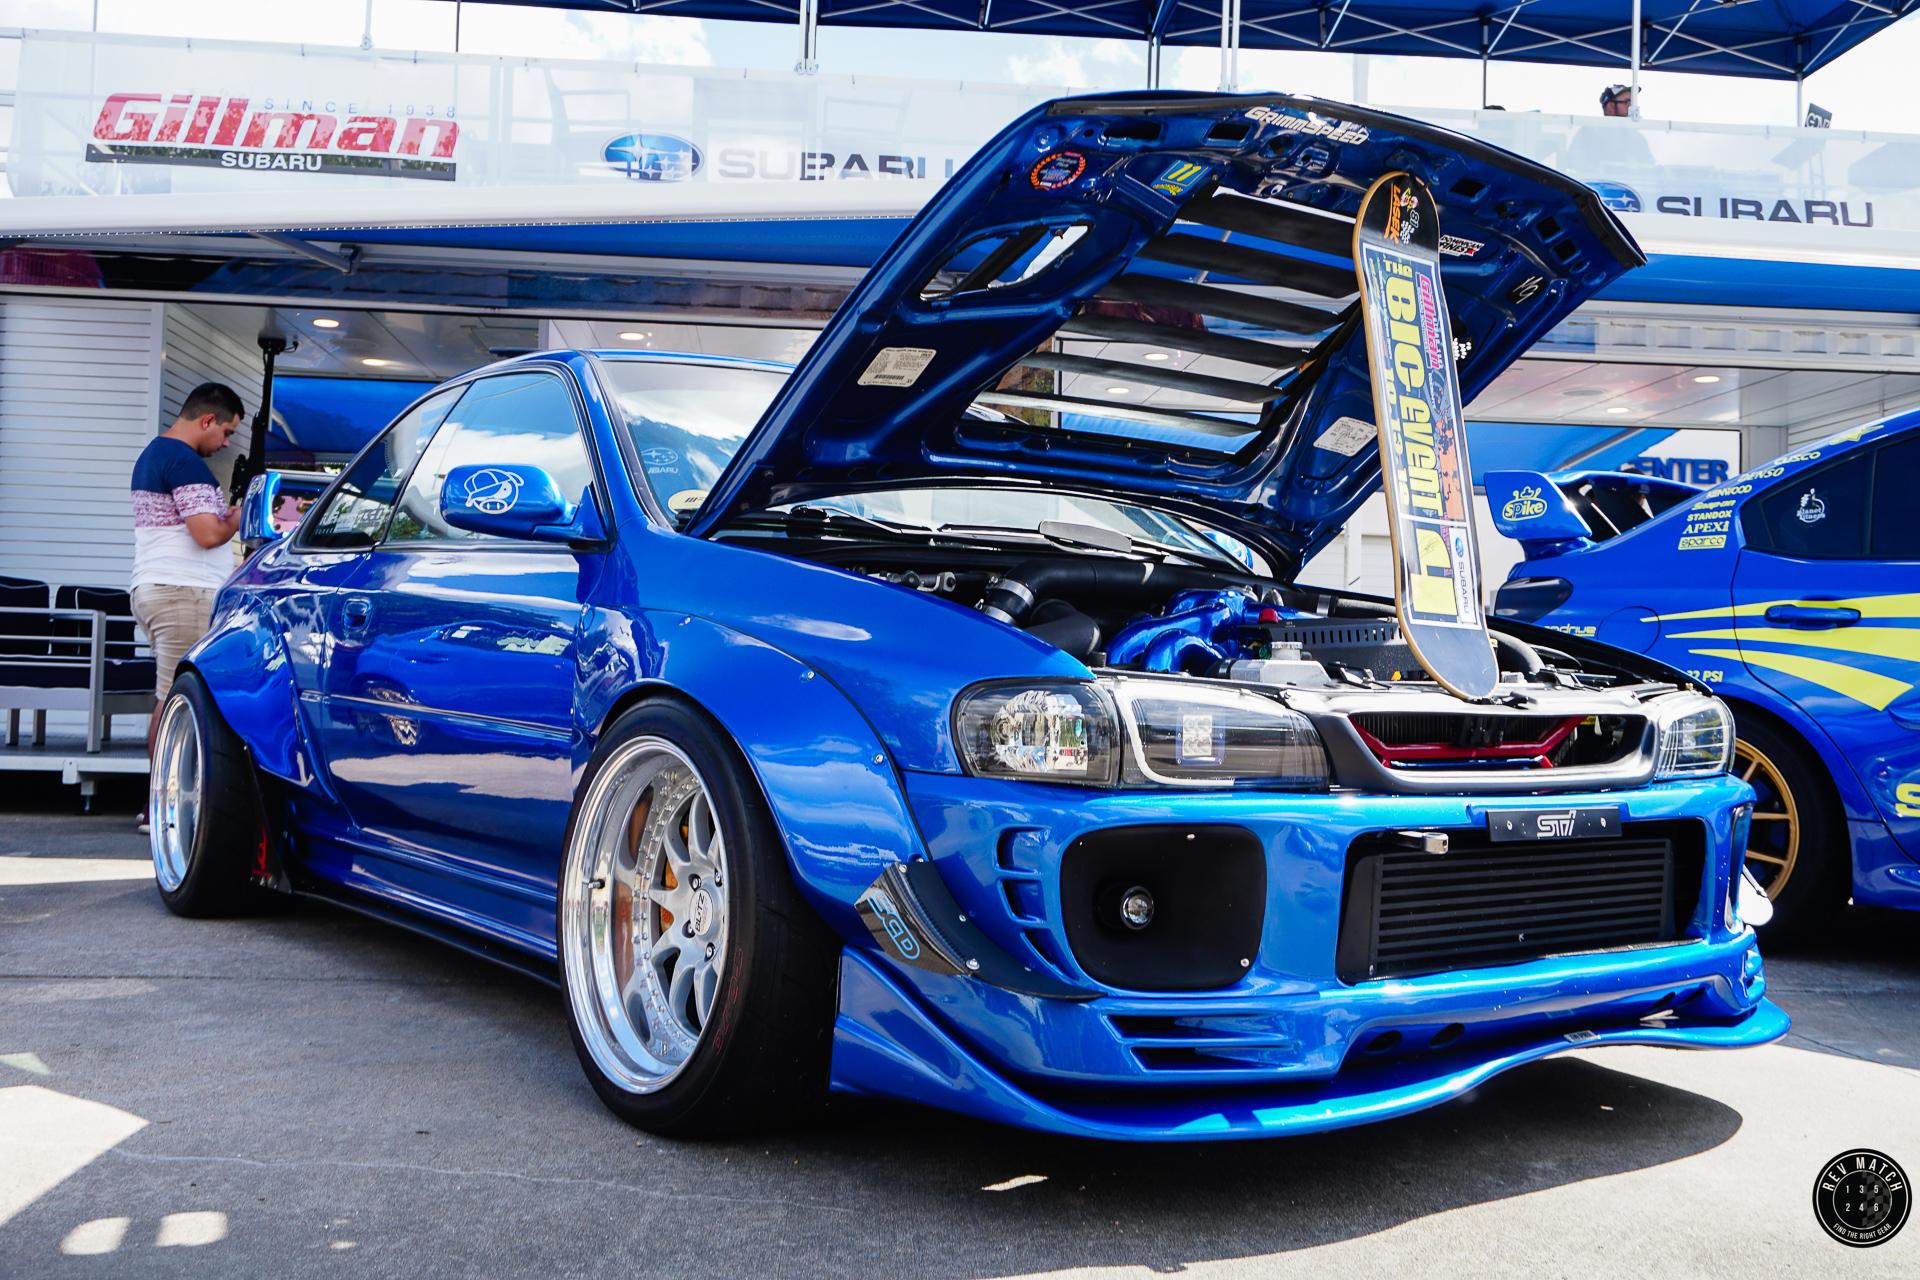 The-Big-Subaru-Event-X-2018-Rev-Match-Media-1.jpg